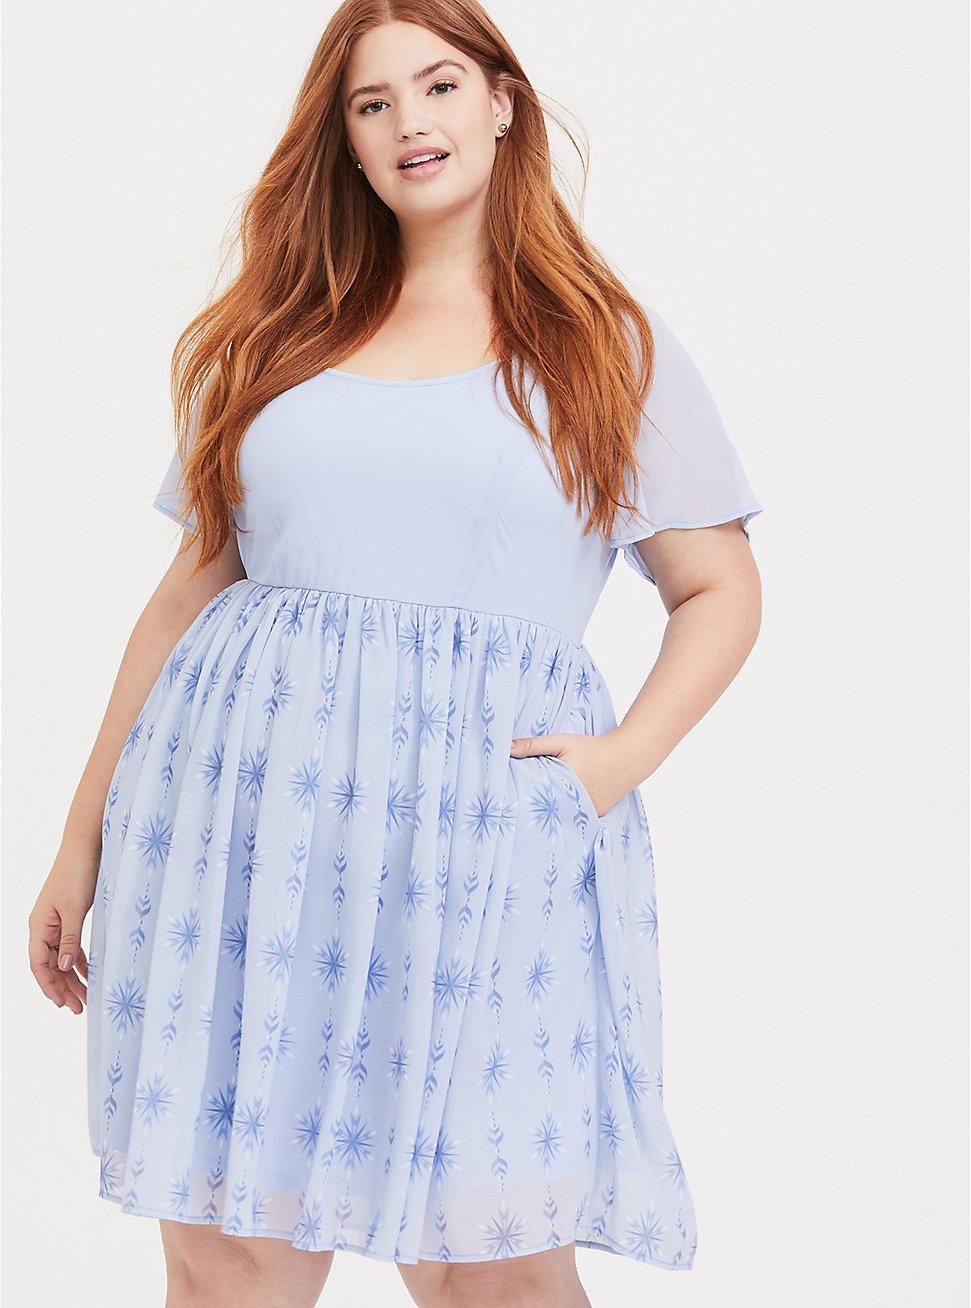 Plus Size Disney Frozen 2 Elsa Snowflake Light Blue Chiffon Dress, LIGHT BLUE, hi-res